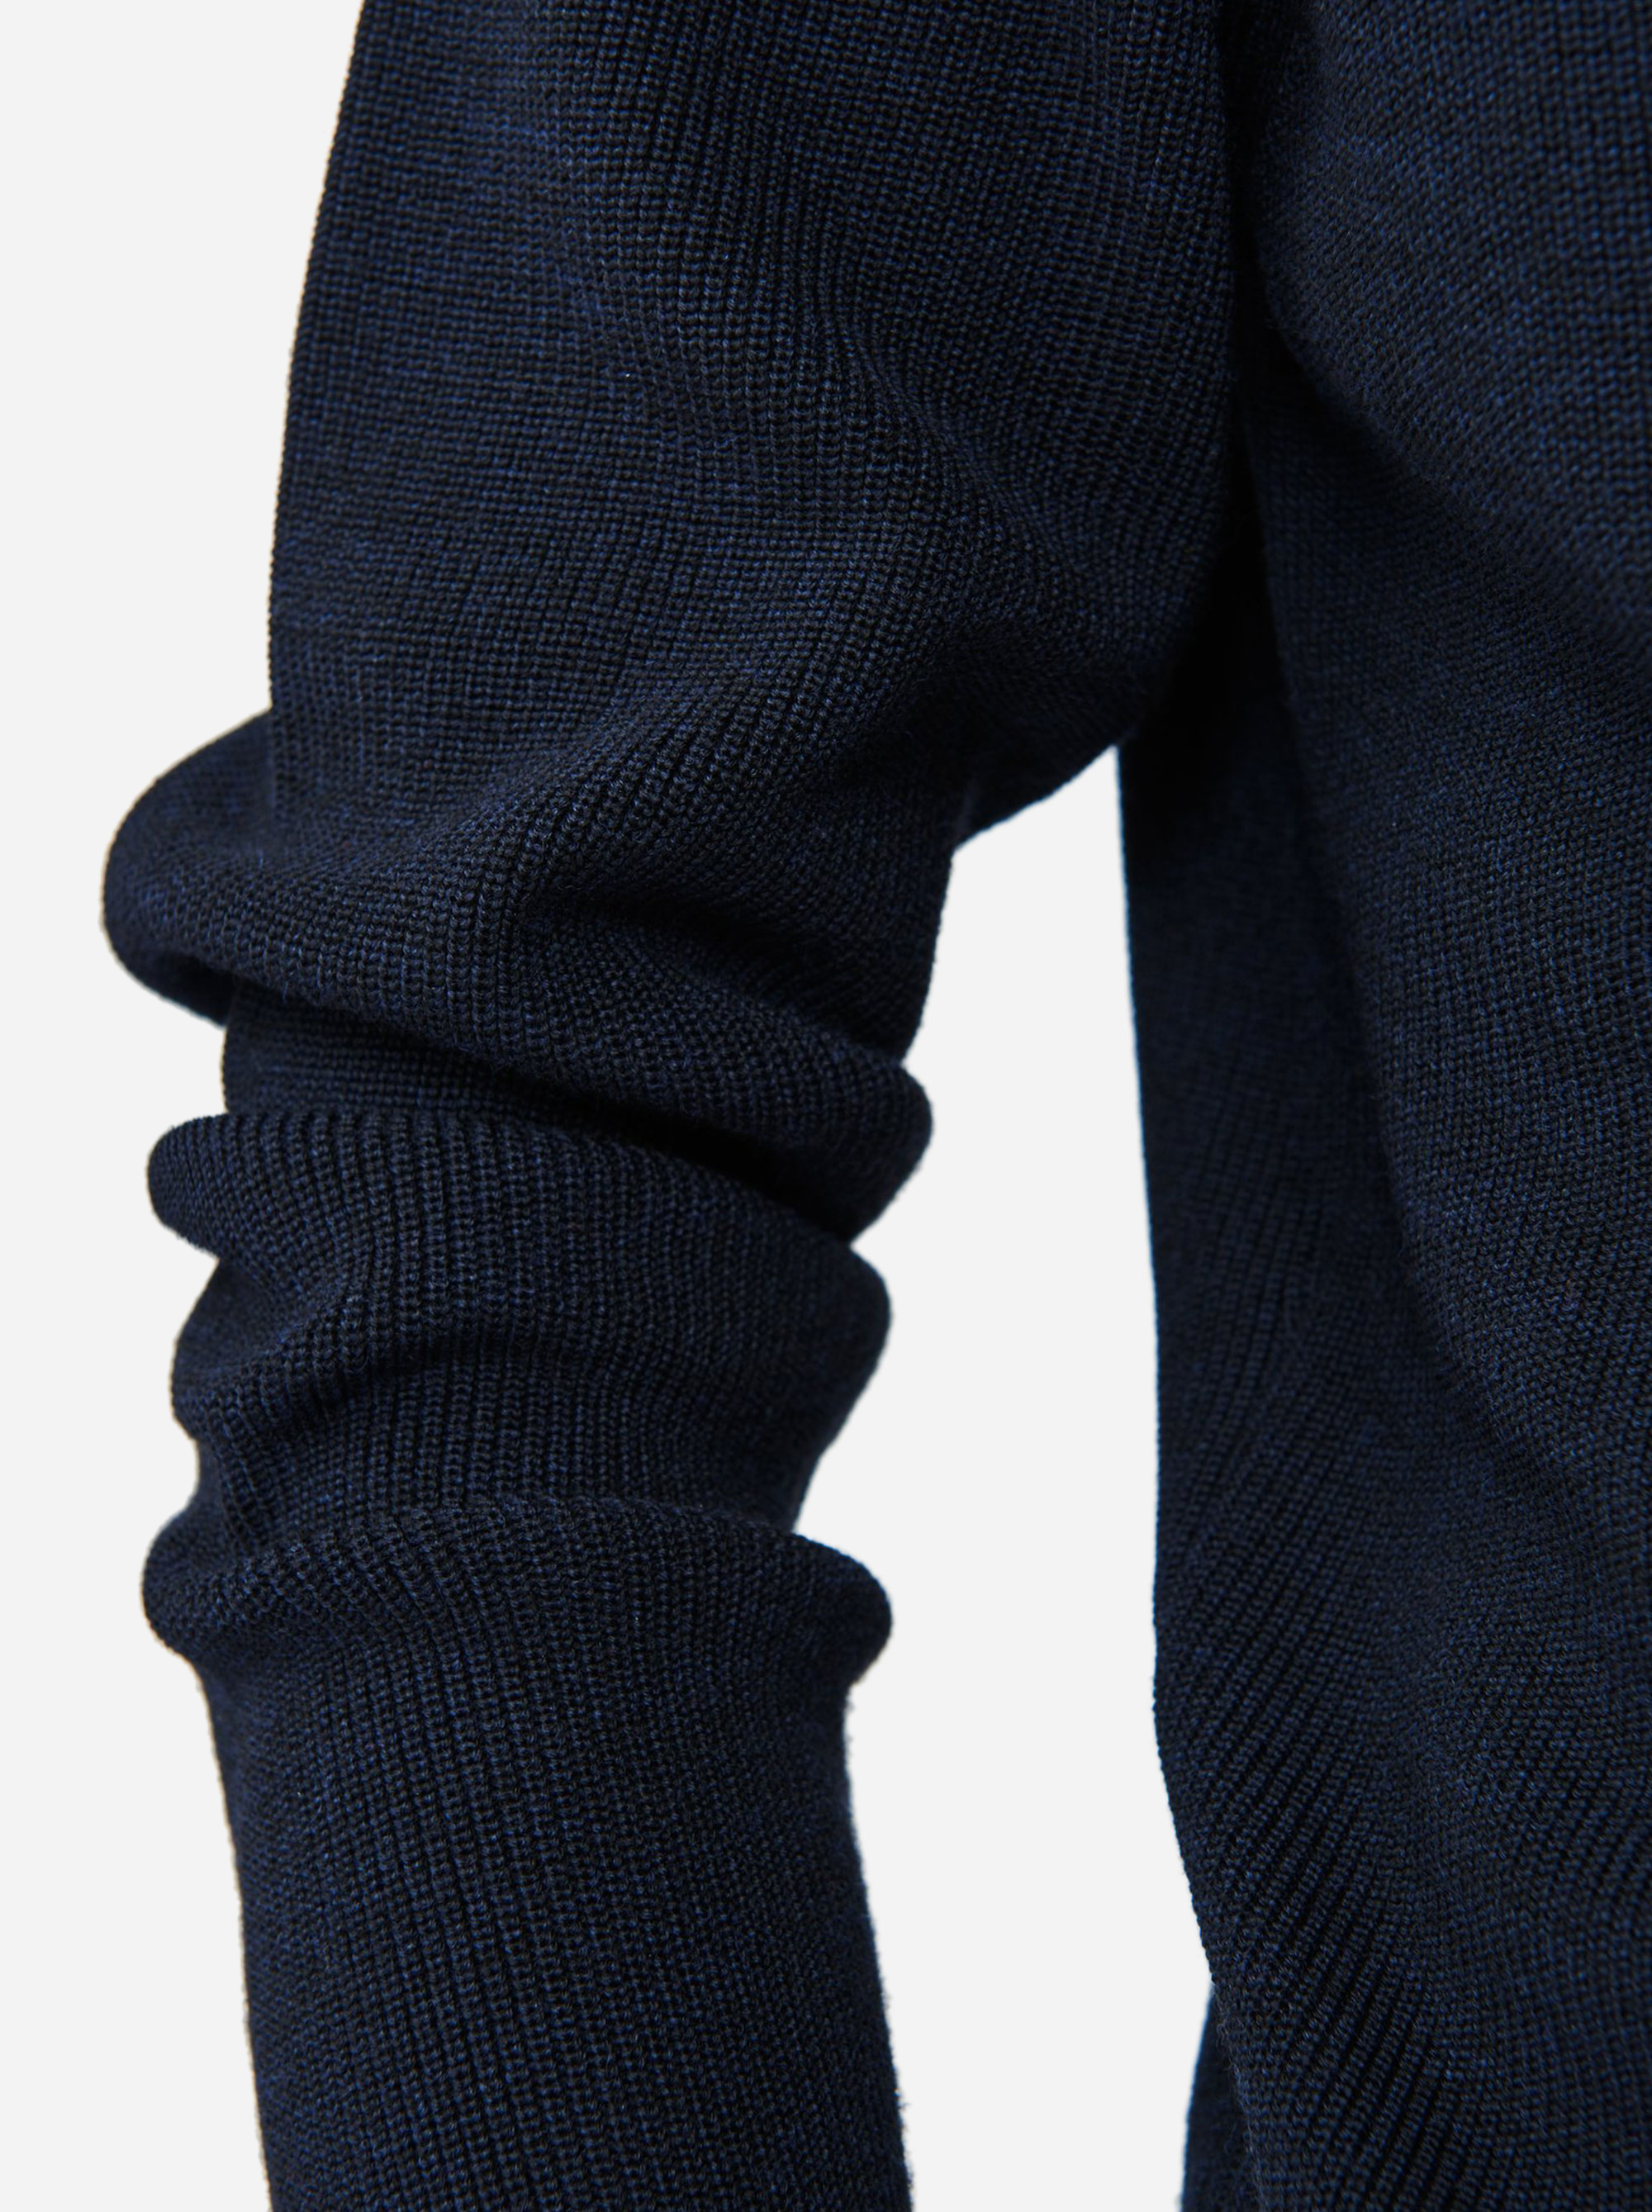 Teym - Turtleneck - The Merino Sweater - Men - Blue